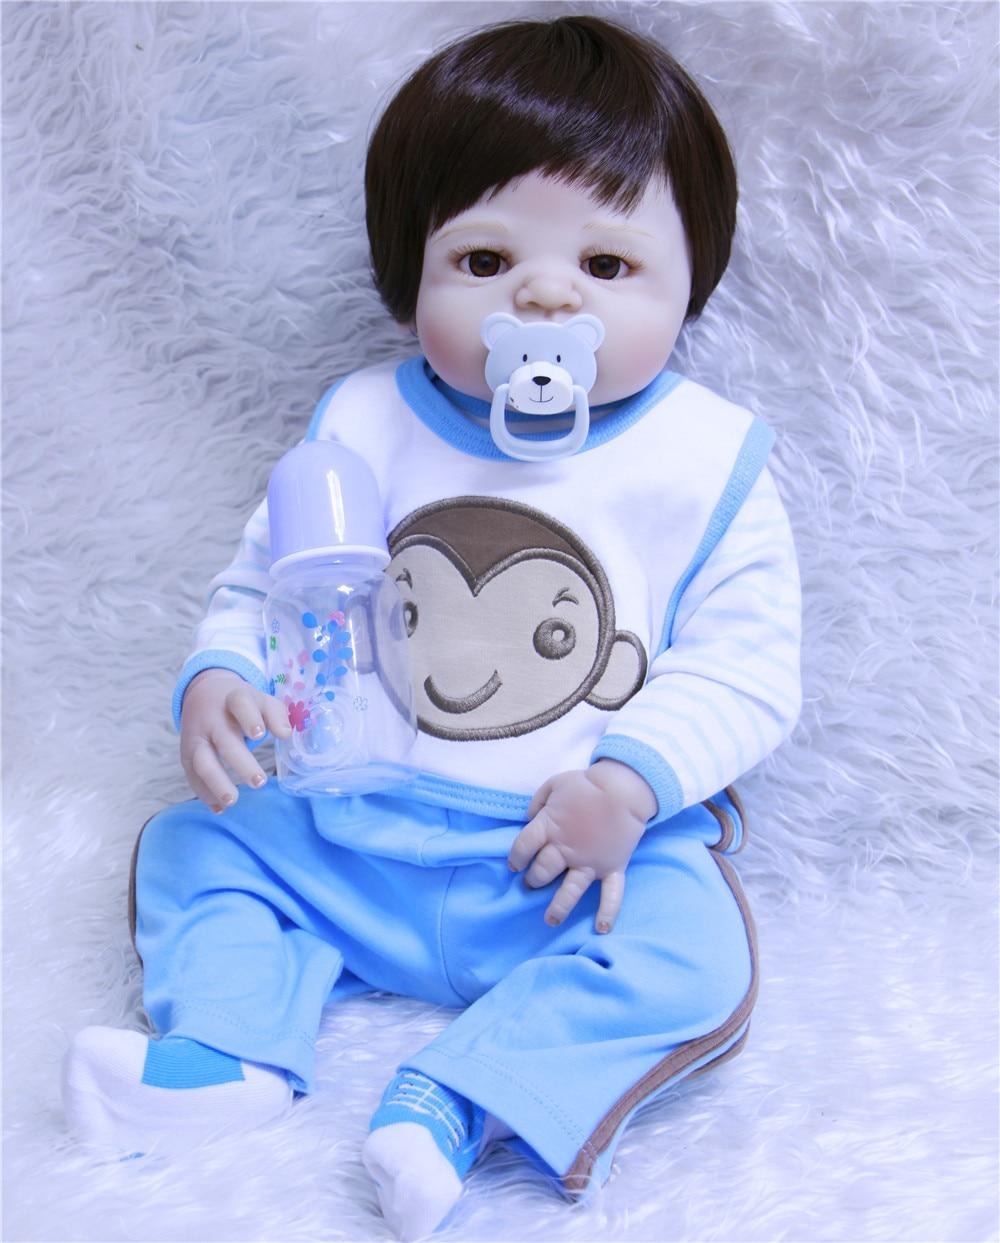 New design 55cm Soft full Silicone Doll Reborn Baby 22 Toy For baby Newborn Baby Birthday Gift bathe boy bonecas dolls for saleNew design 55cm Soft full Silicone Doll Reborn Baby 22 Toy For baby Newborn Baby Birthday Gift bathe boy bonecas dolls for sale